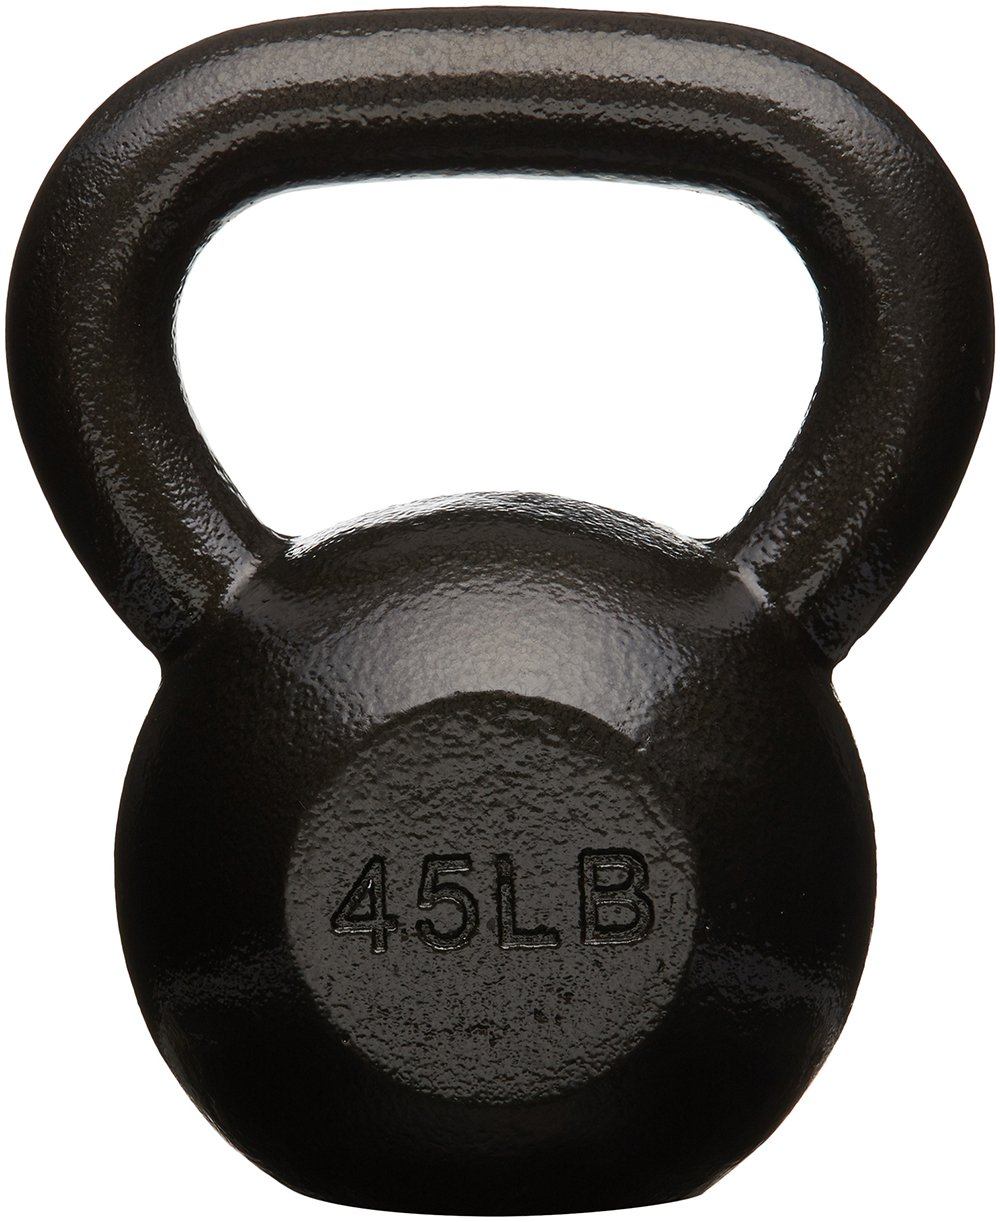 AmazonBasics Cast Iron Kettlebell, 45 lb by AmazonBasics (Image #1)